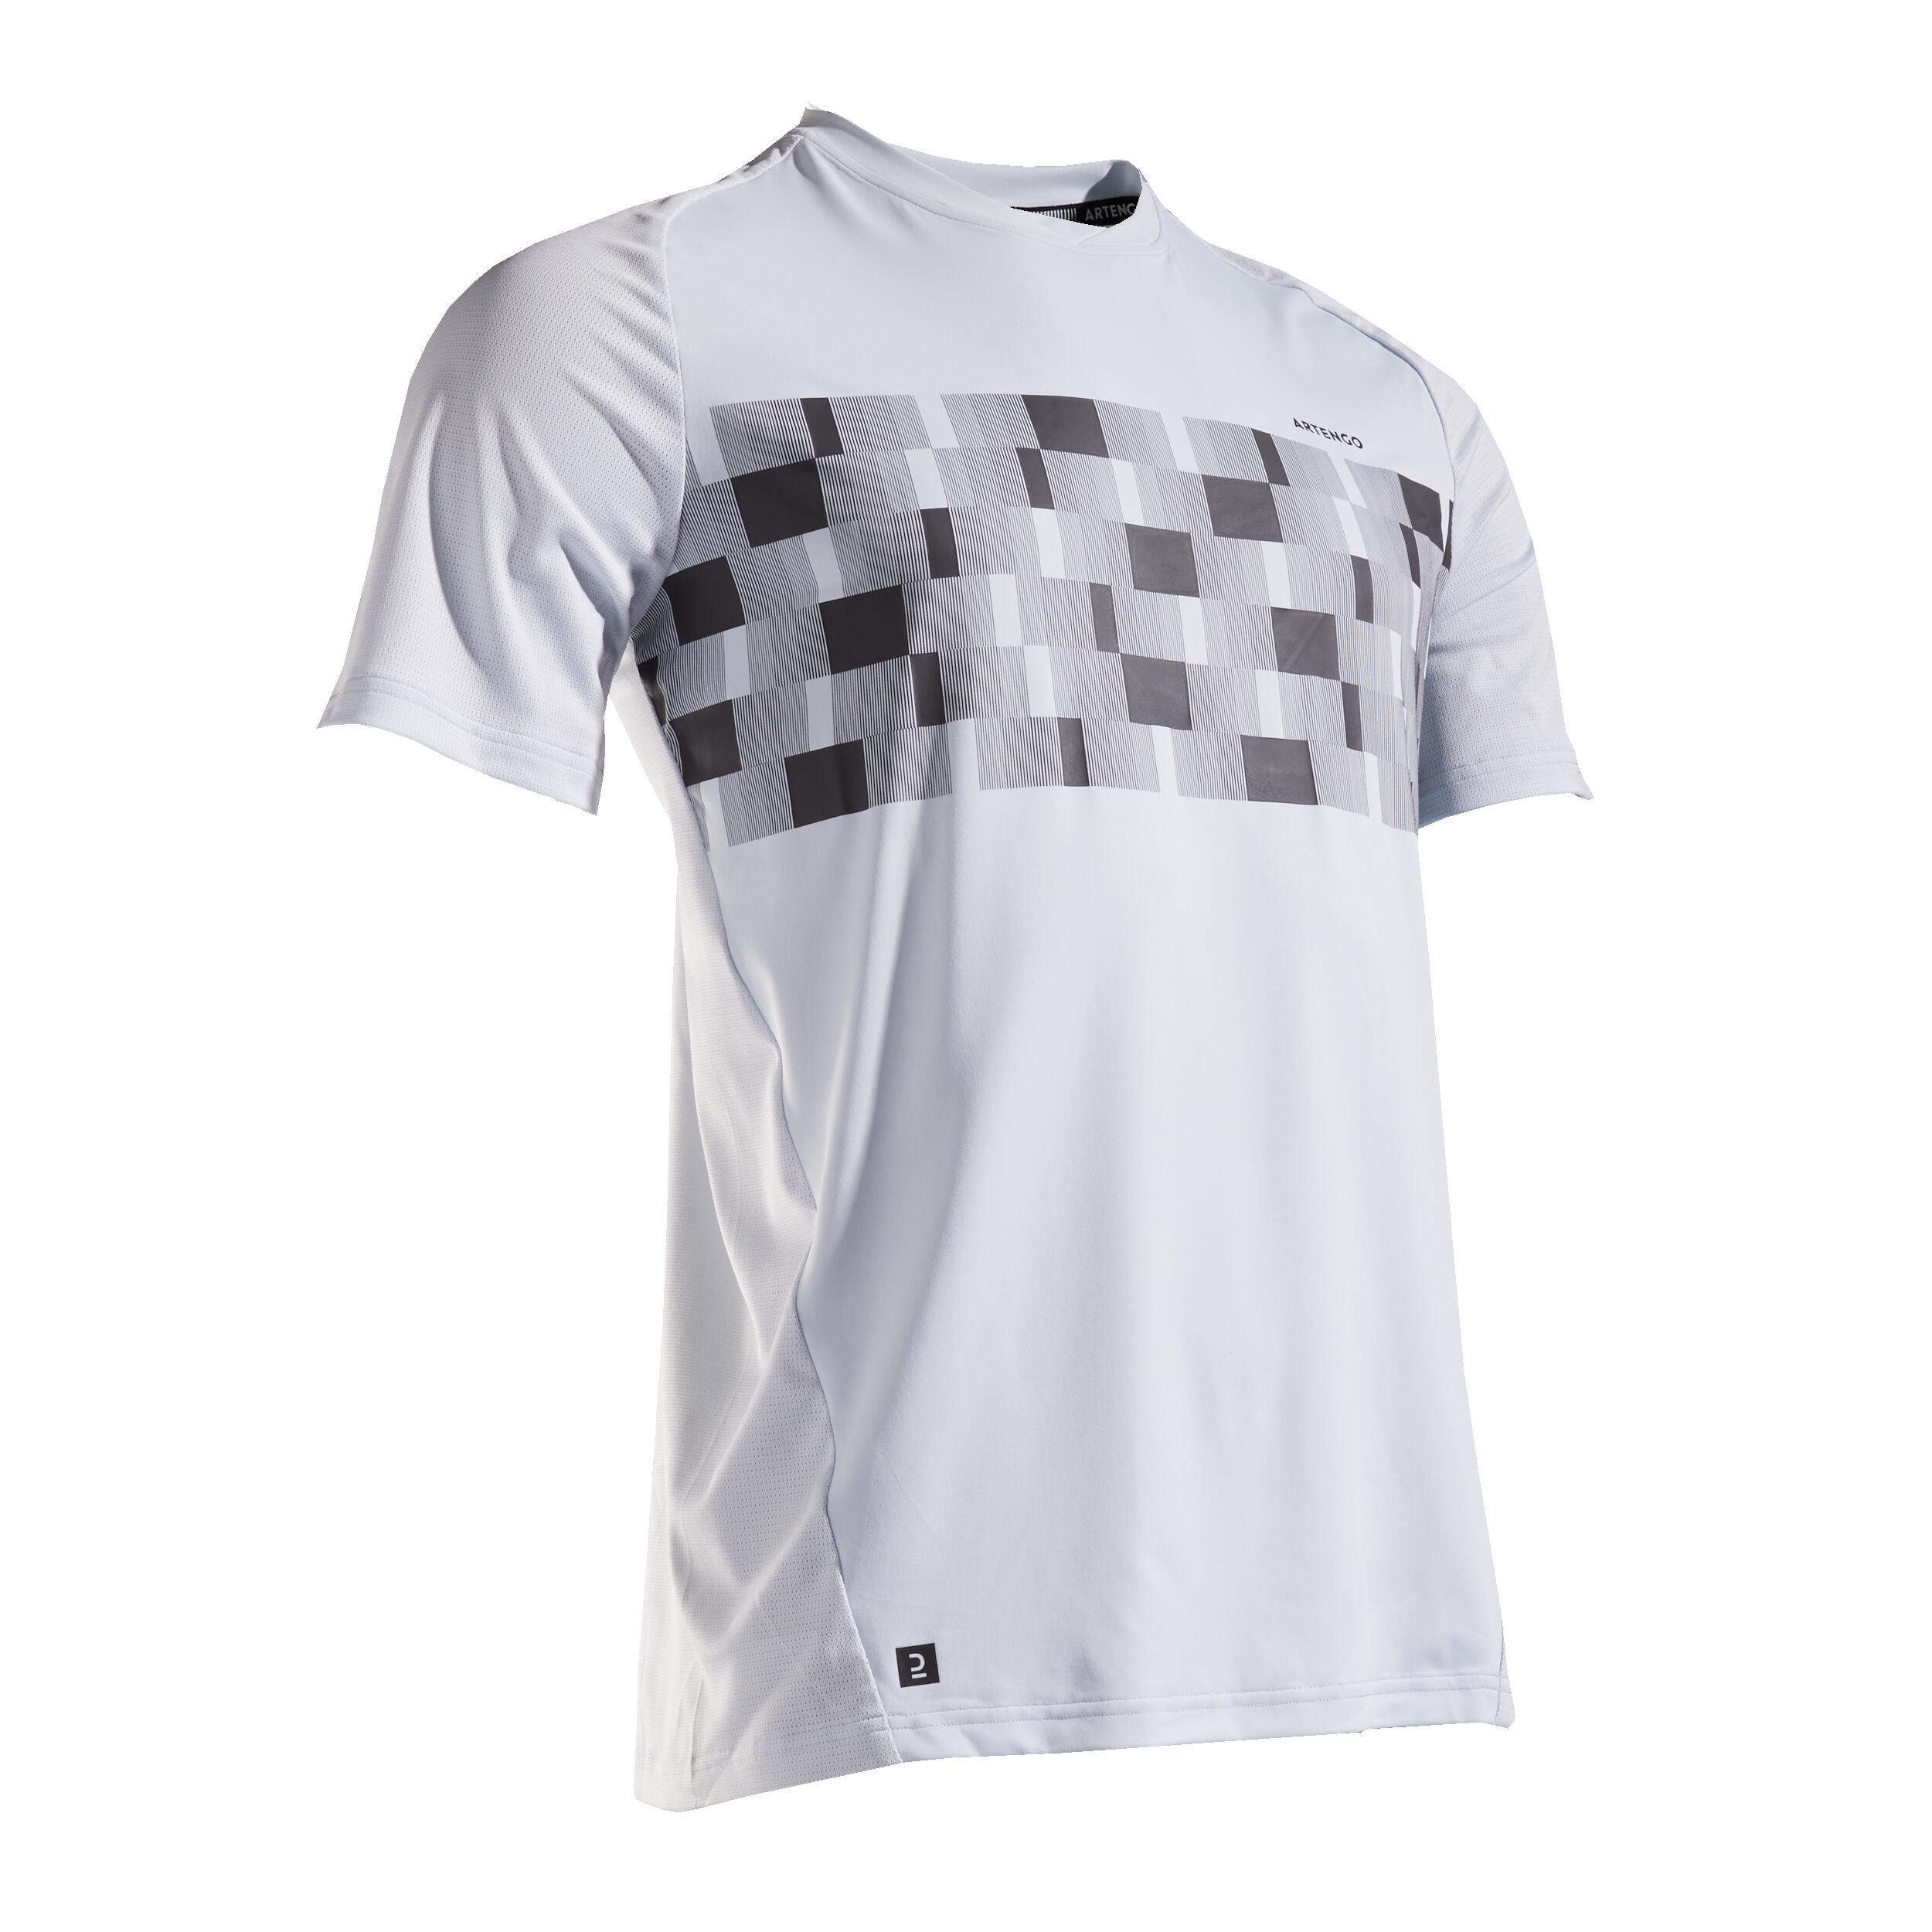 Tricou TTS500 DRY Bărbați imagine